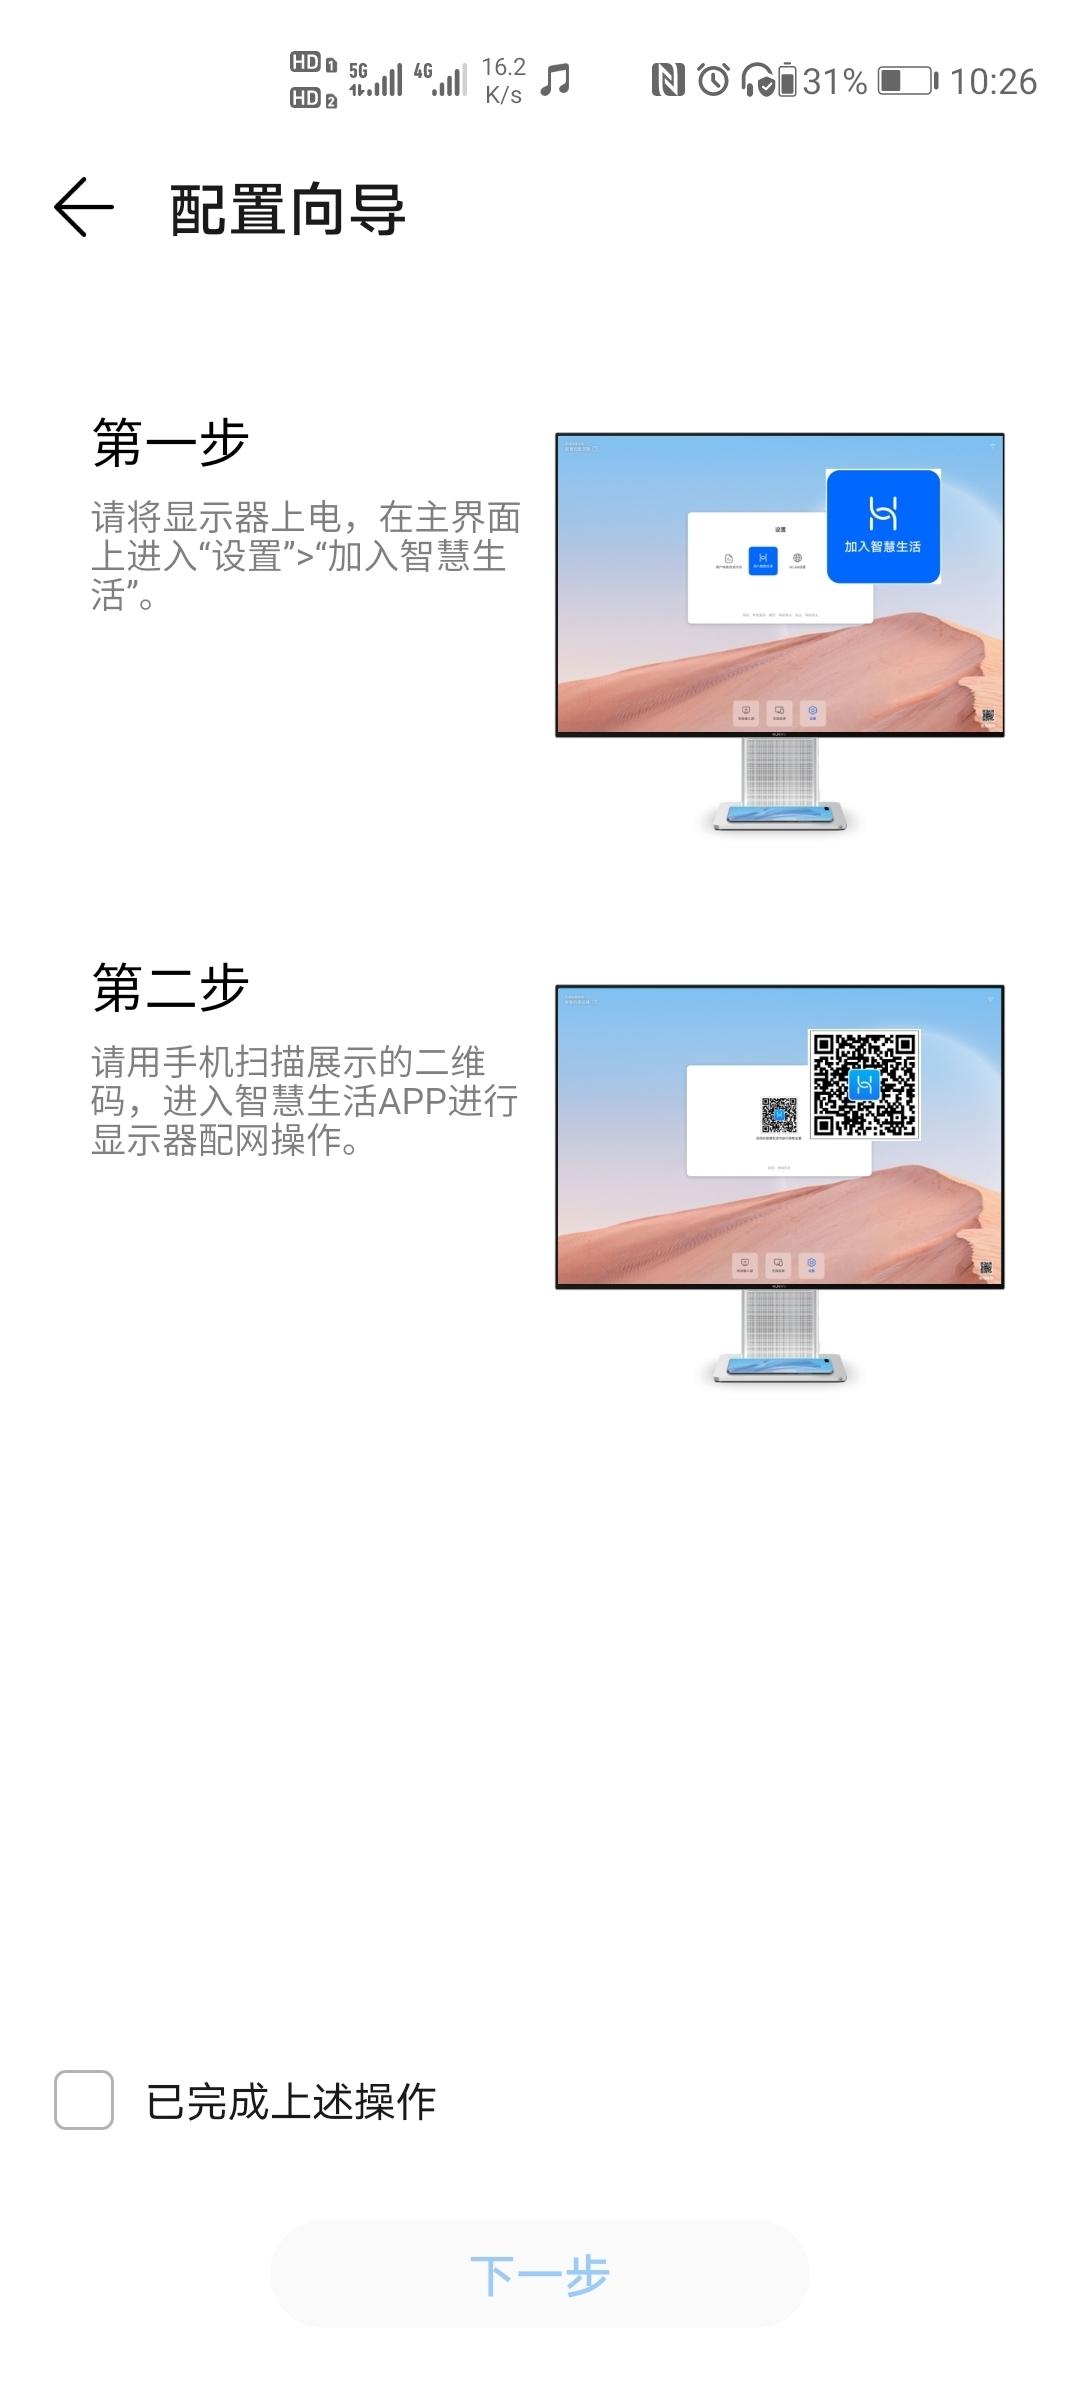 Screenshot_20210514_111842_com.android.gallery3d.jpg